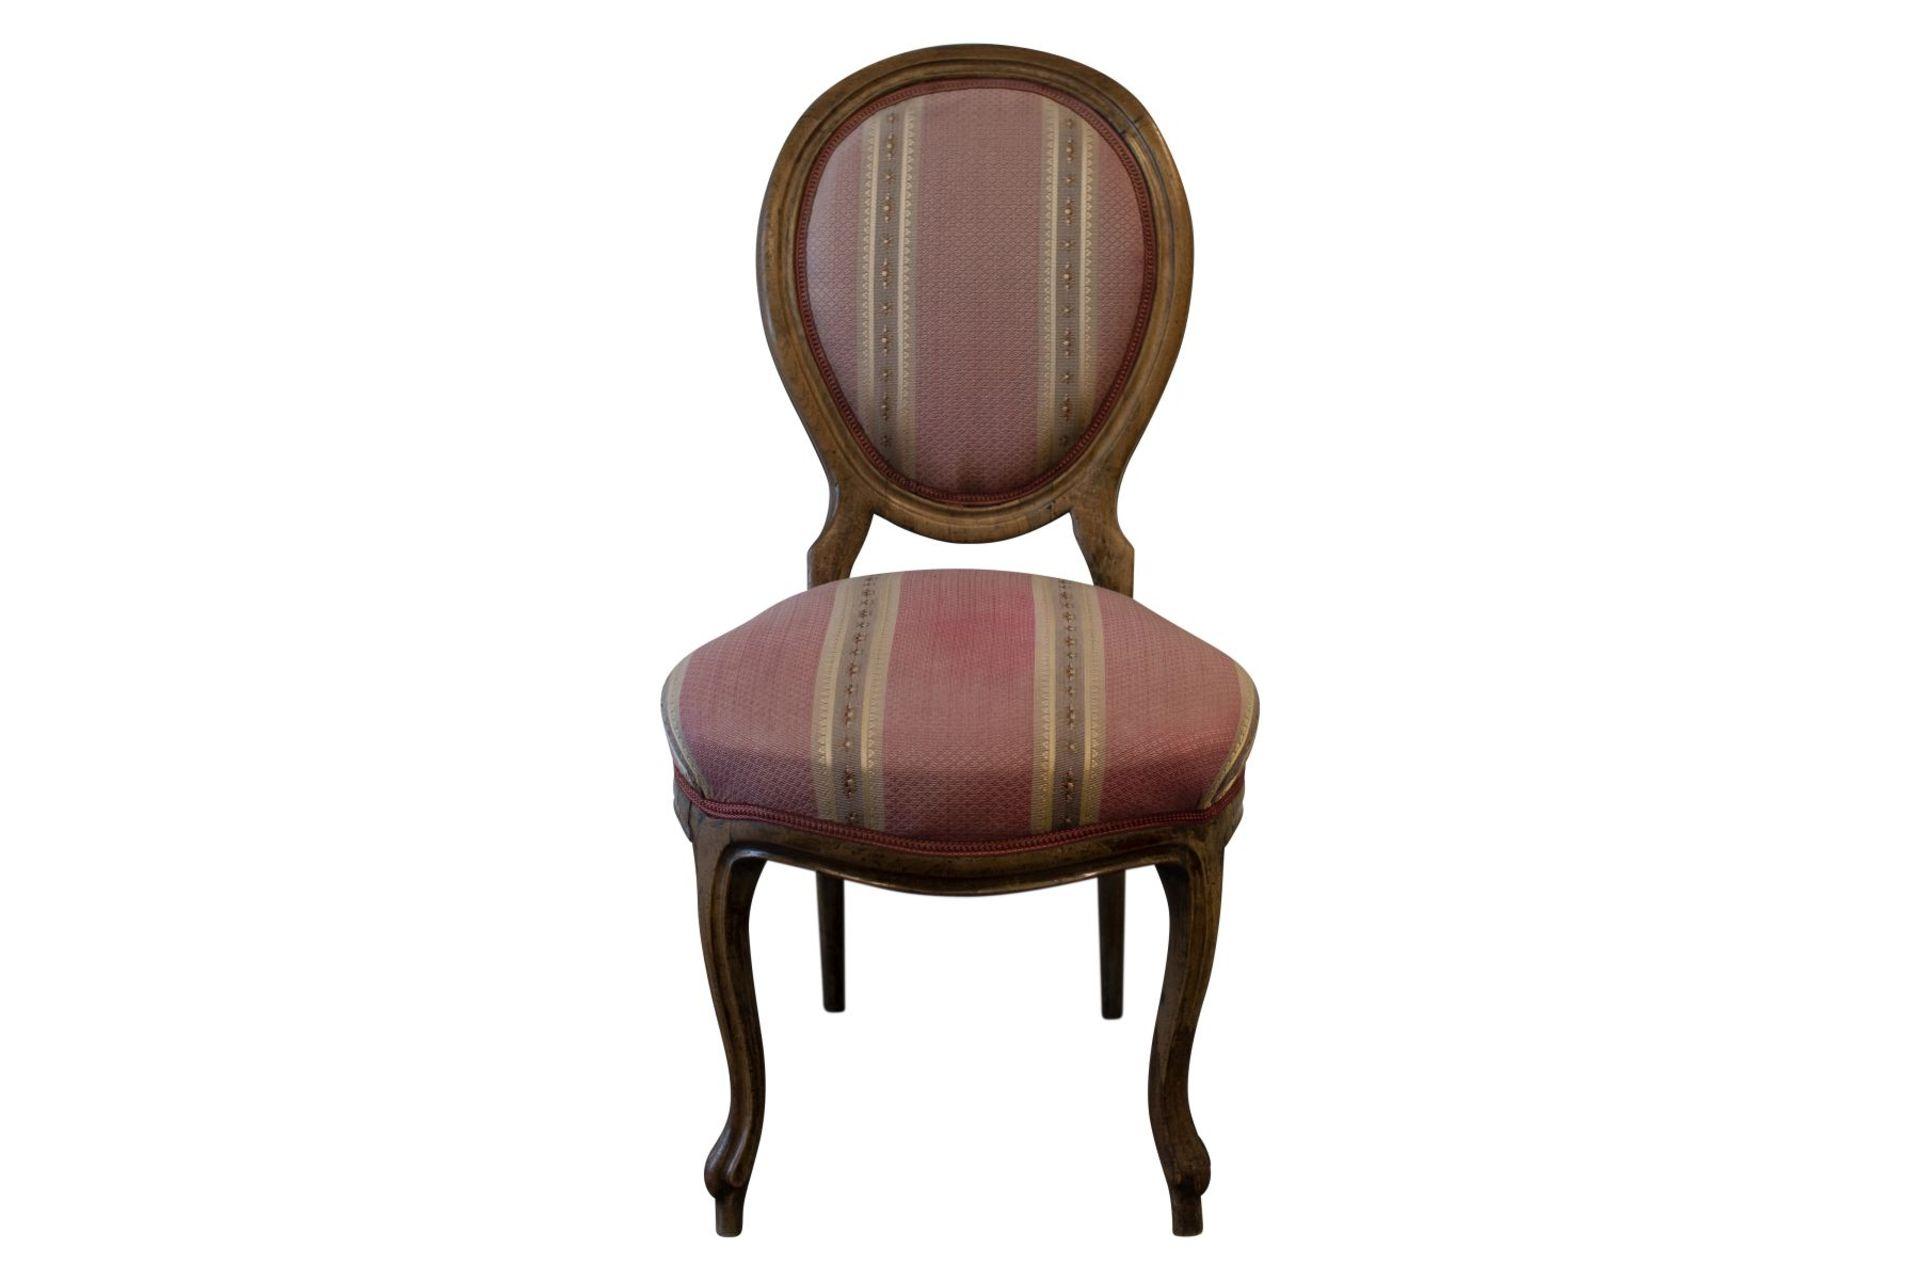 Salon Chairs Biedermeier - Bild 5 aus 8